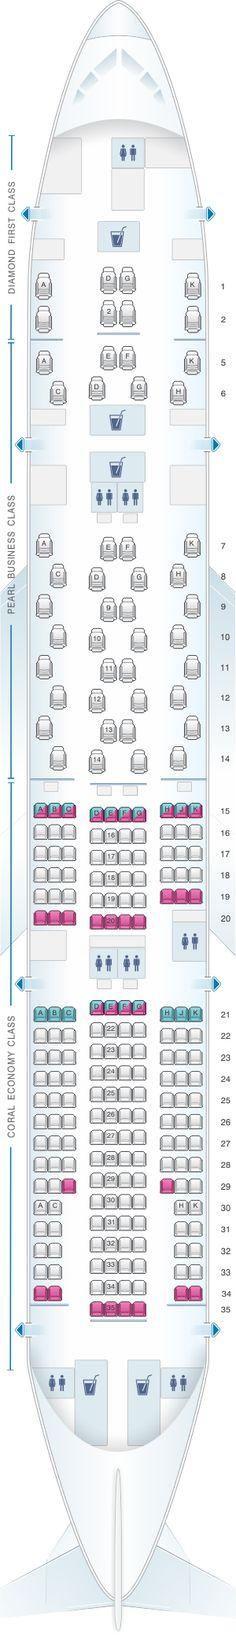 Seat Map Etihad Airways Boeing B777 200LR